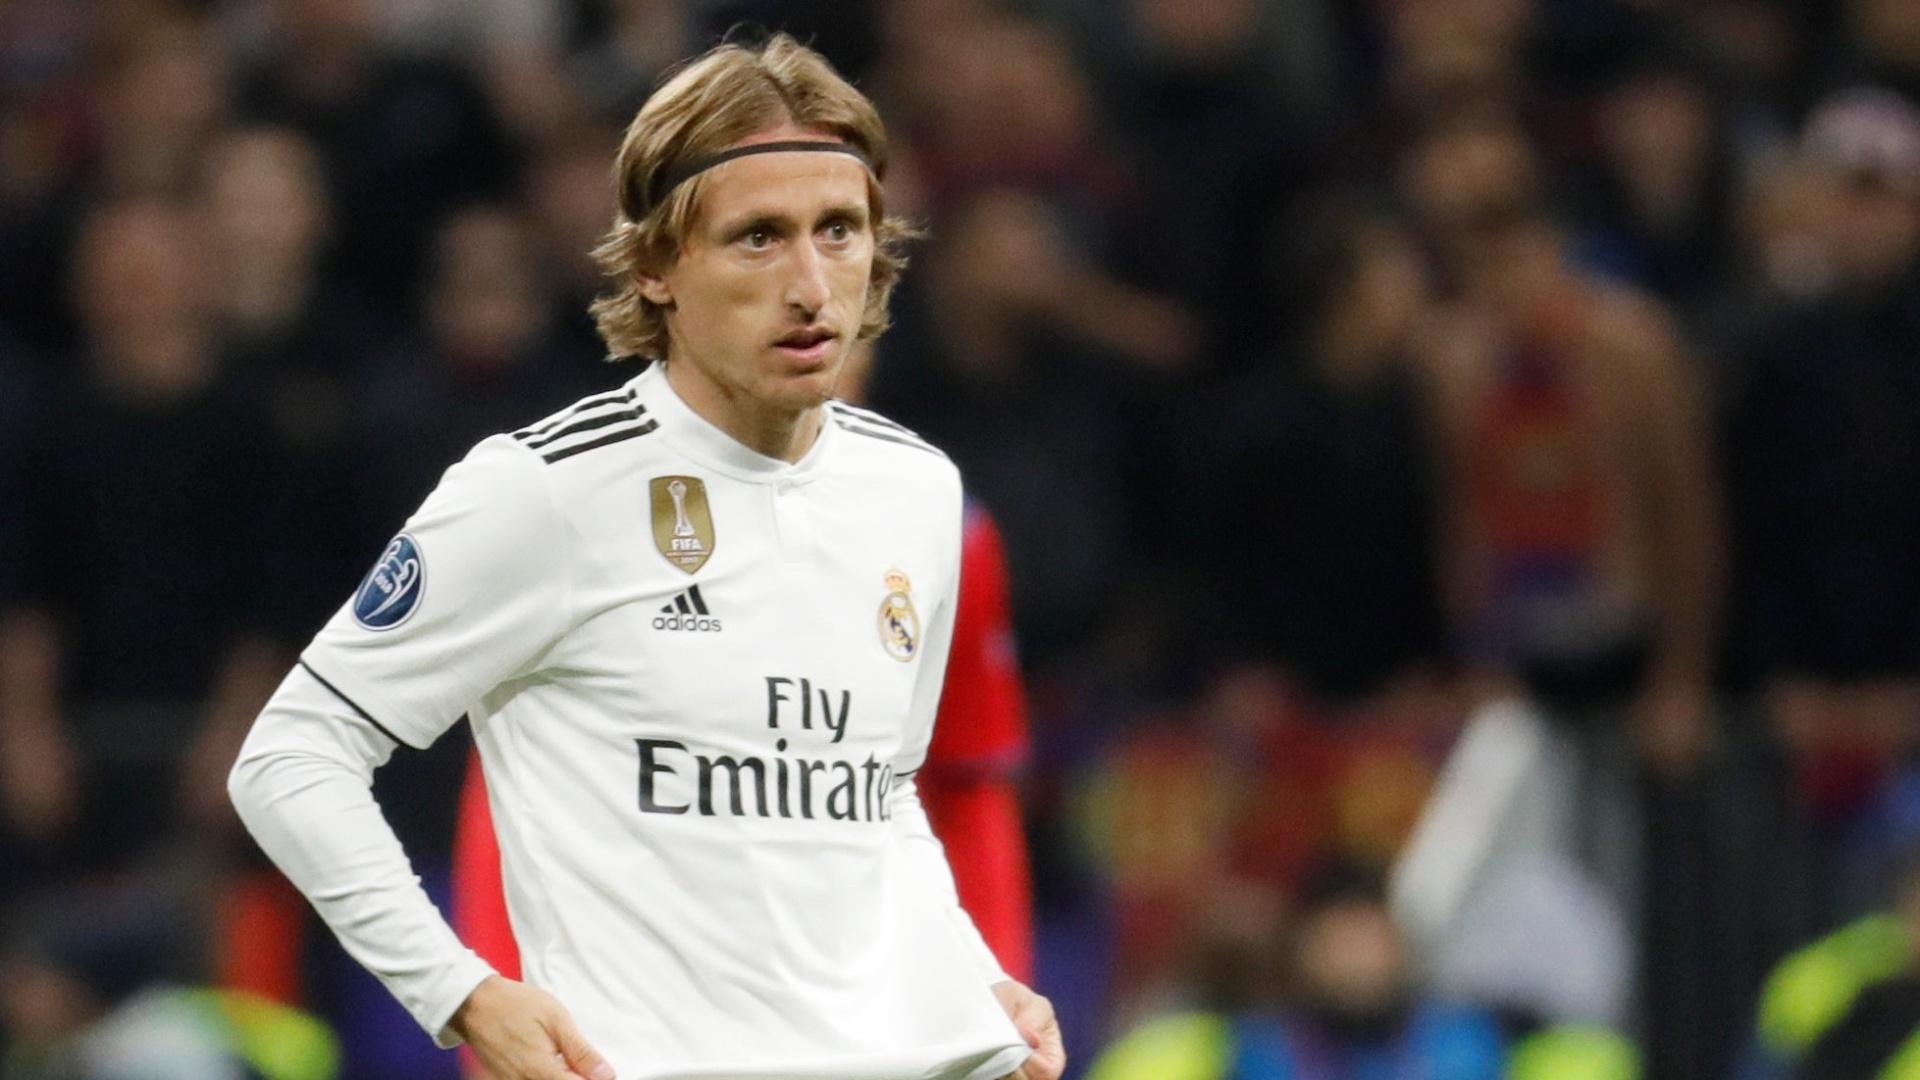 Modric entrou no segundo tempo da partida contra o CSKA